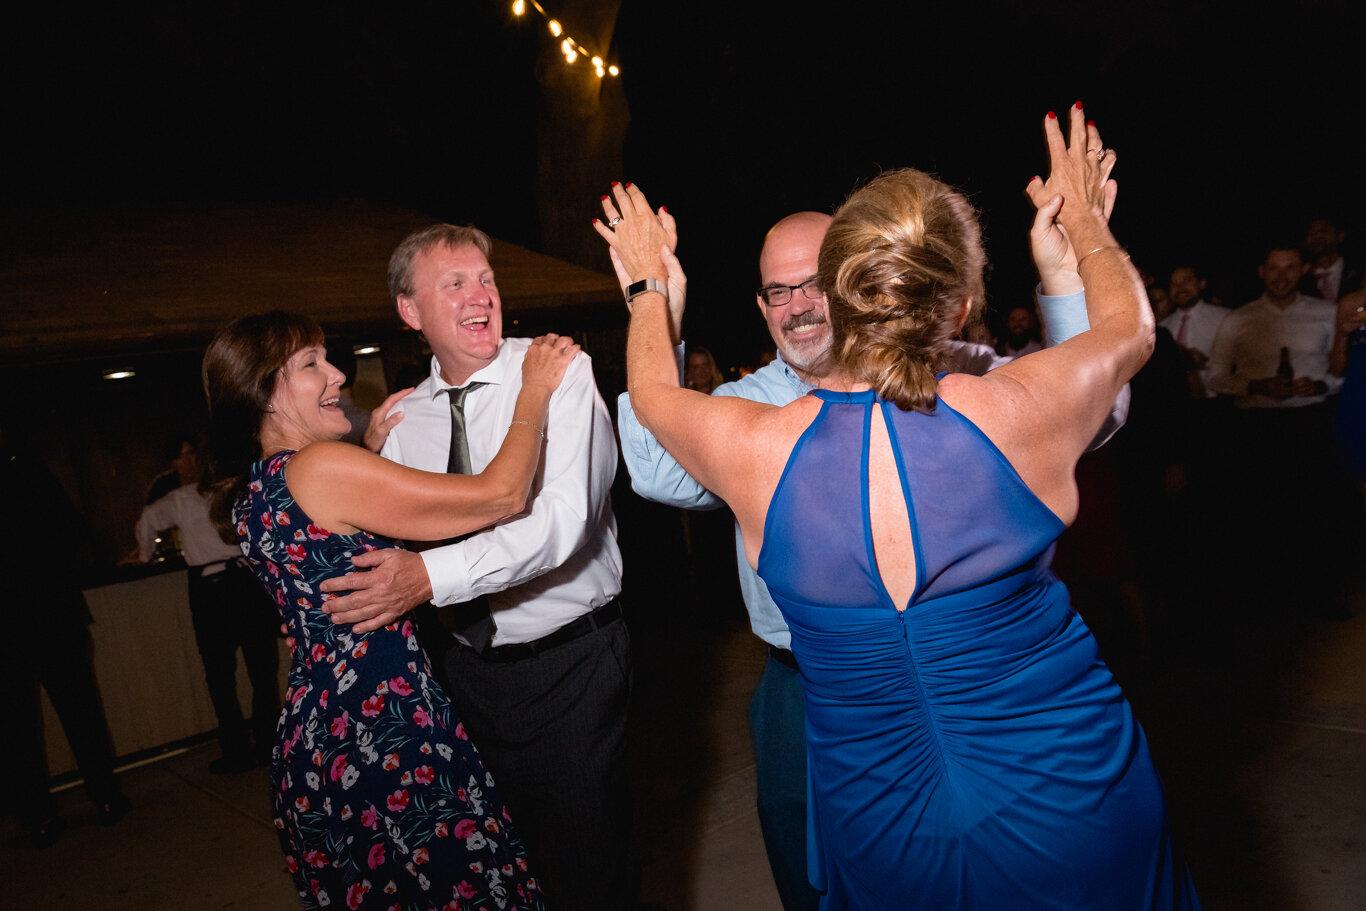 2019.08.24_Emily-Ashir-Wedding-at-the-Maples-6417.jpg